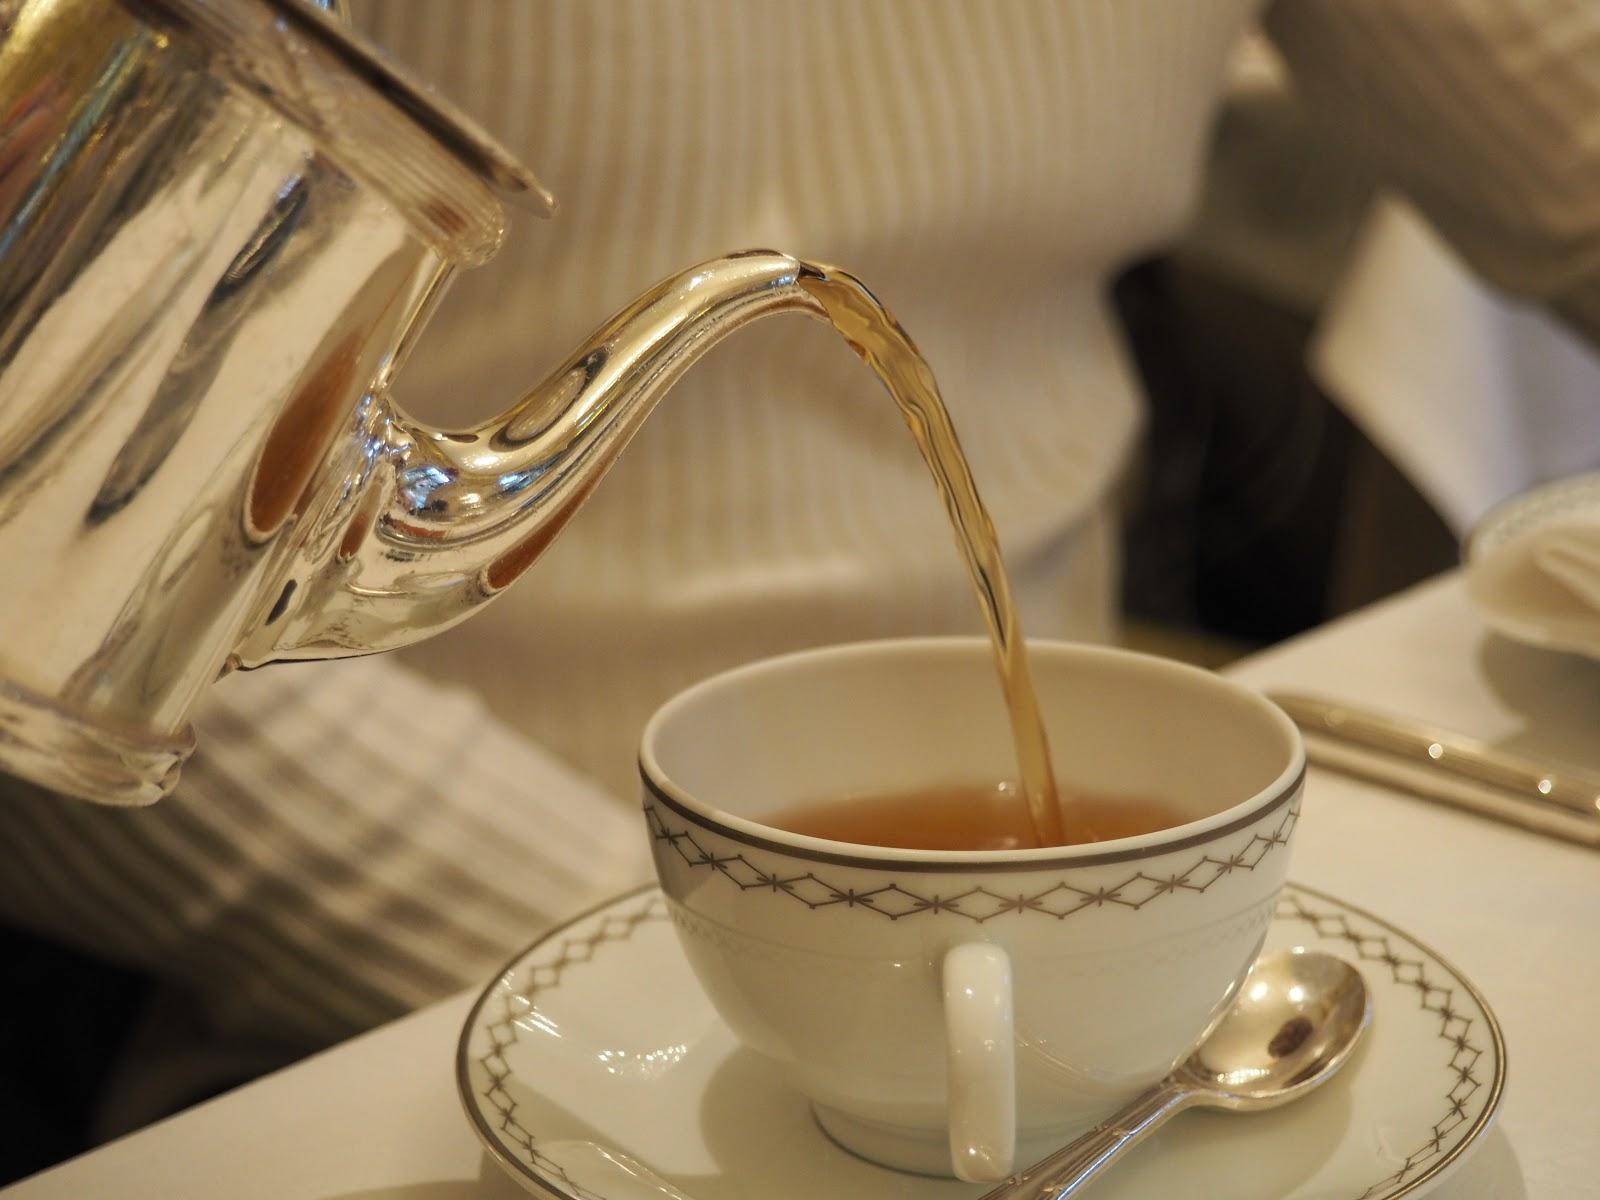 Peninsula Hotel, Paris, Afternoon Tea, Silver Tea Pot pouring tea in cup